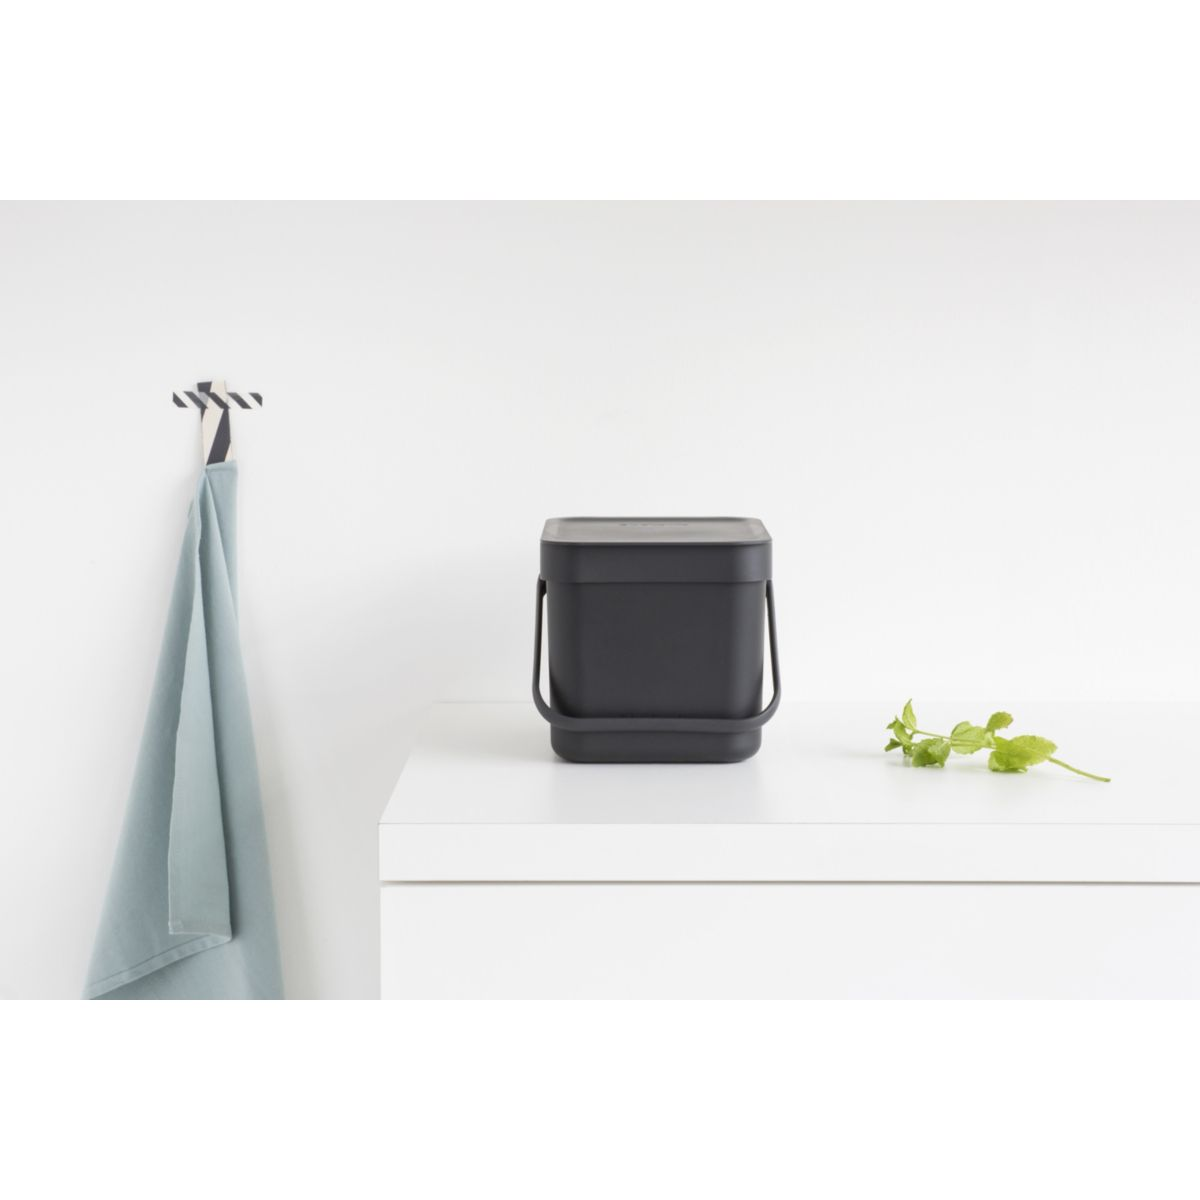 Poubelle manuelle BRABANTIA Waste Bin Sort & Go 6L Grey